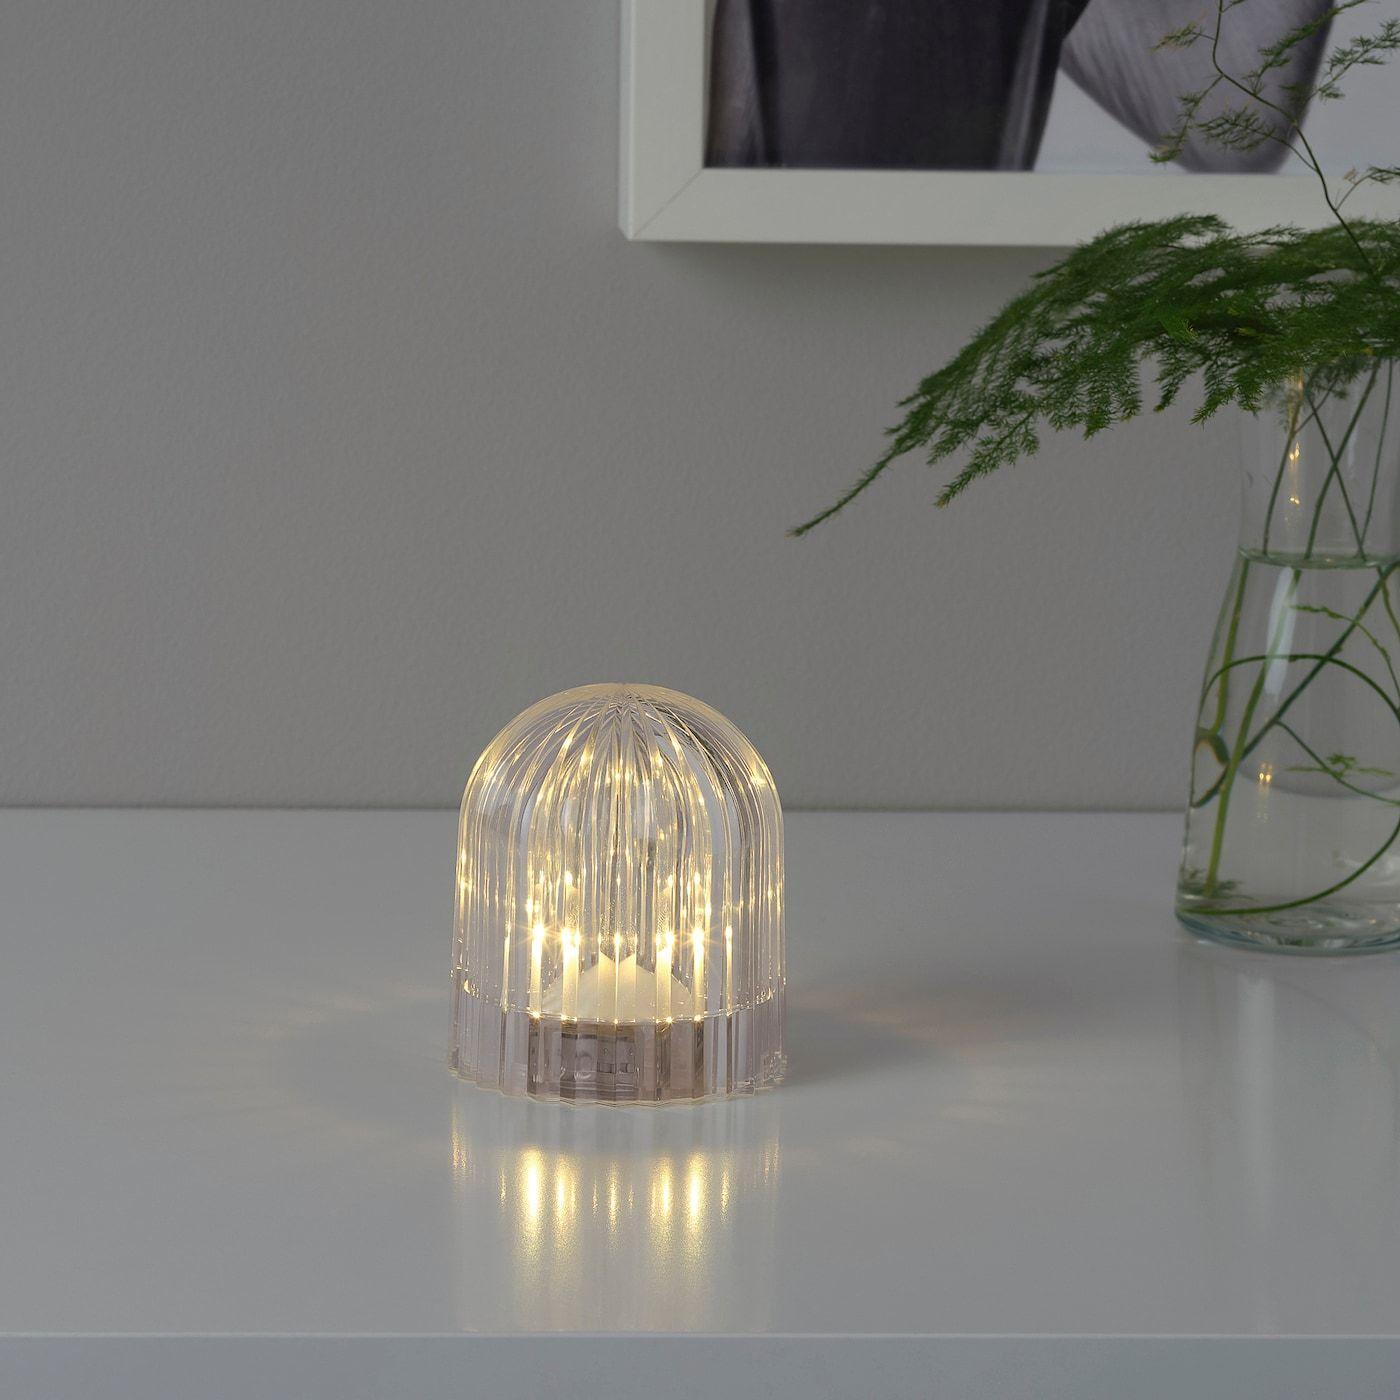 Ikea Aktiverad Led Decorative Light In 2020 Led Decorative Lights Light Decorations Led Decor